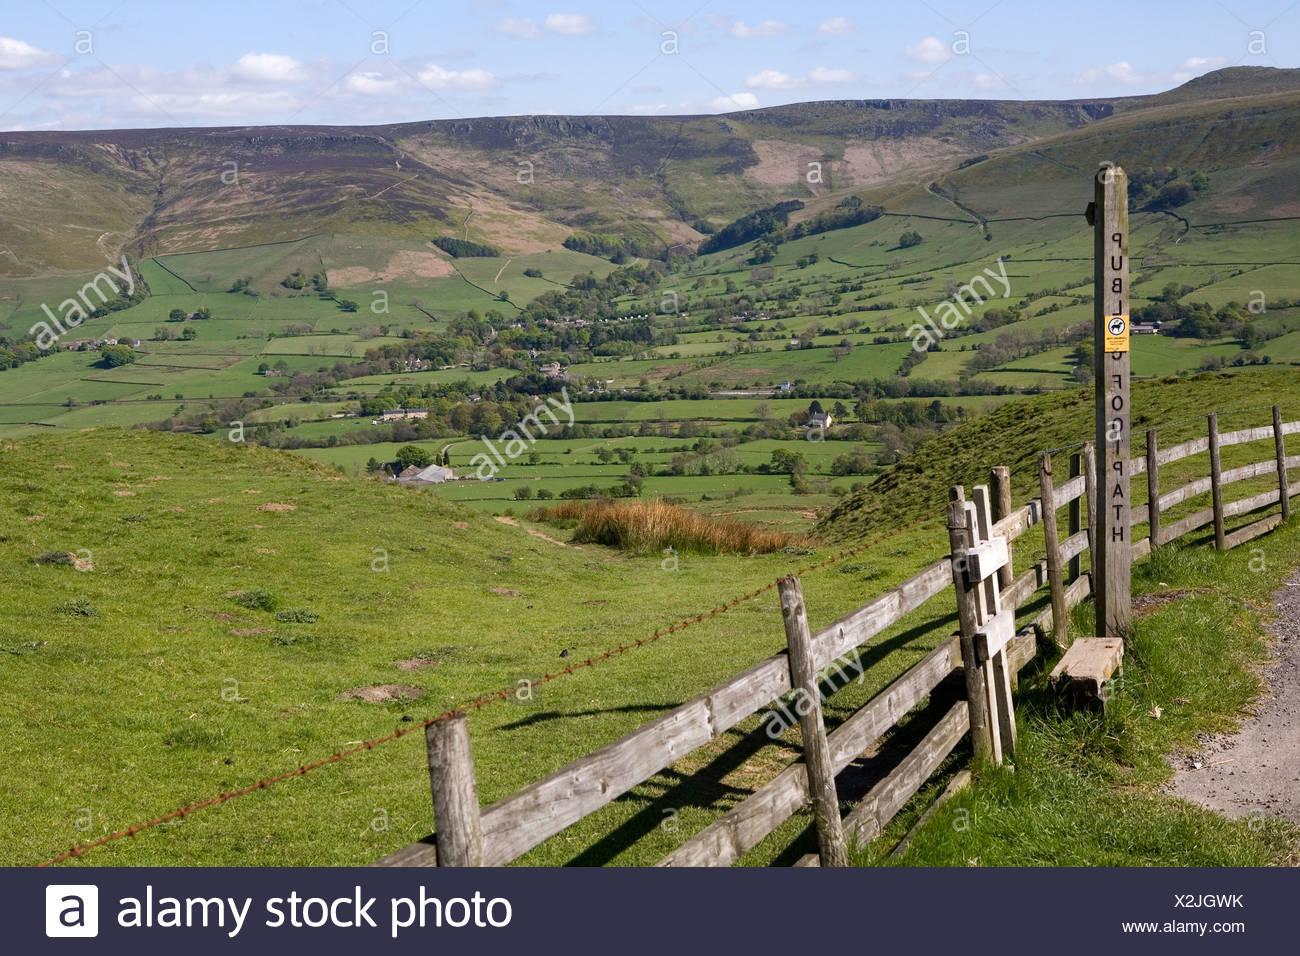 England, Derbyshire, Peak District National Park, Edale valley - Stock Image